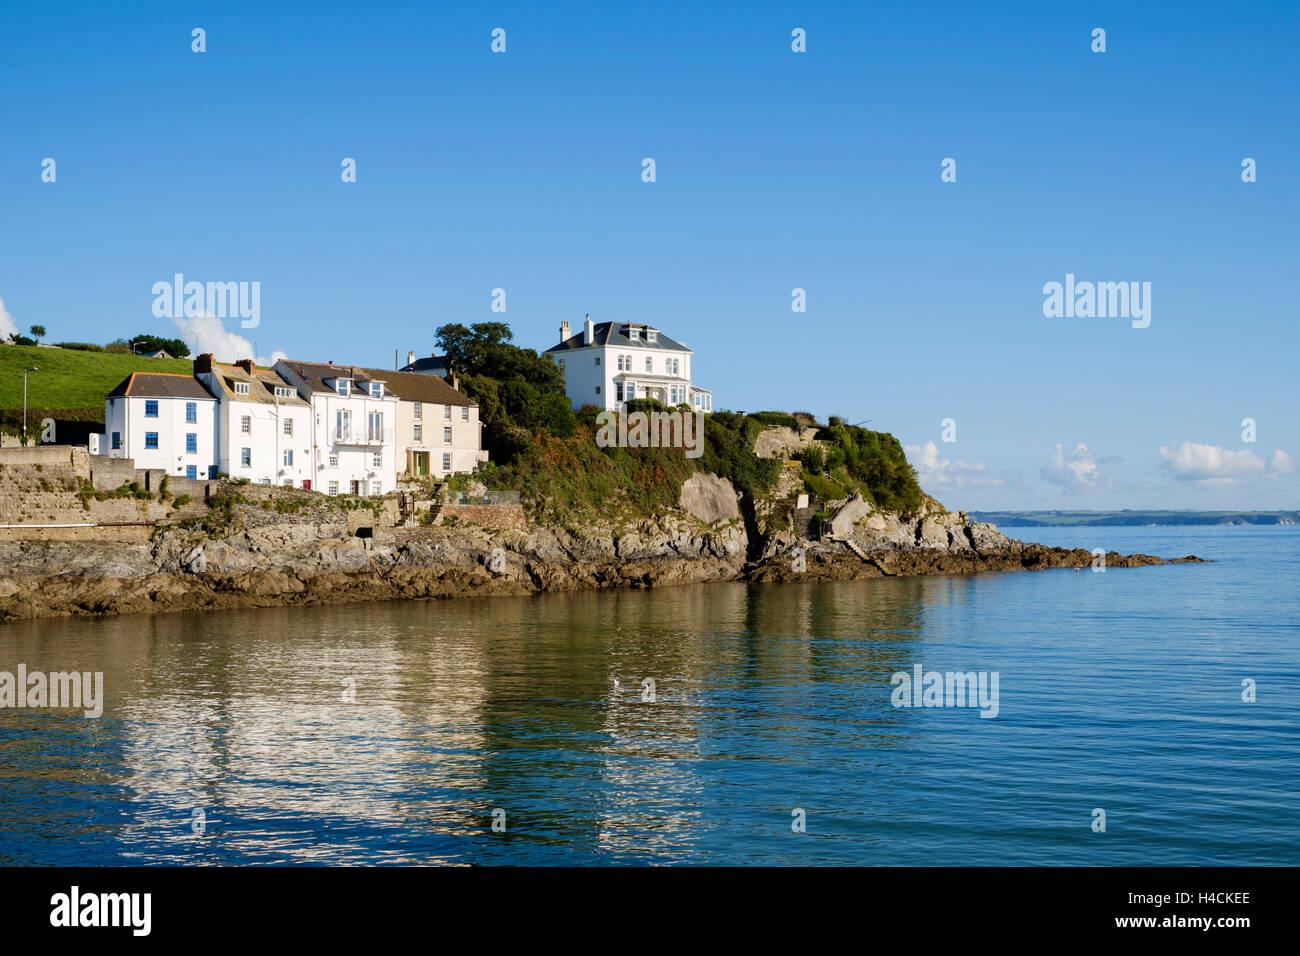 Seafront property rocks at Portmellon, Cornwall, England, United Kingdom - Stock Image